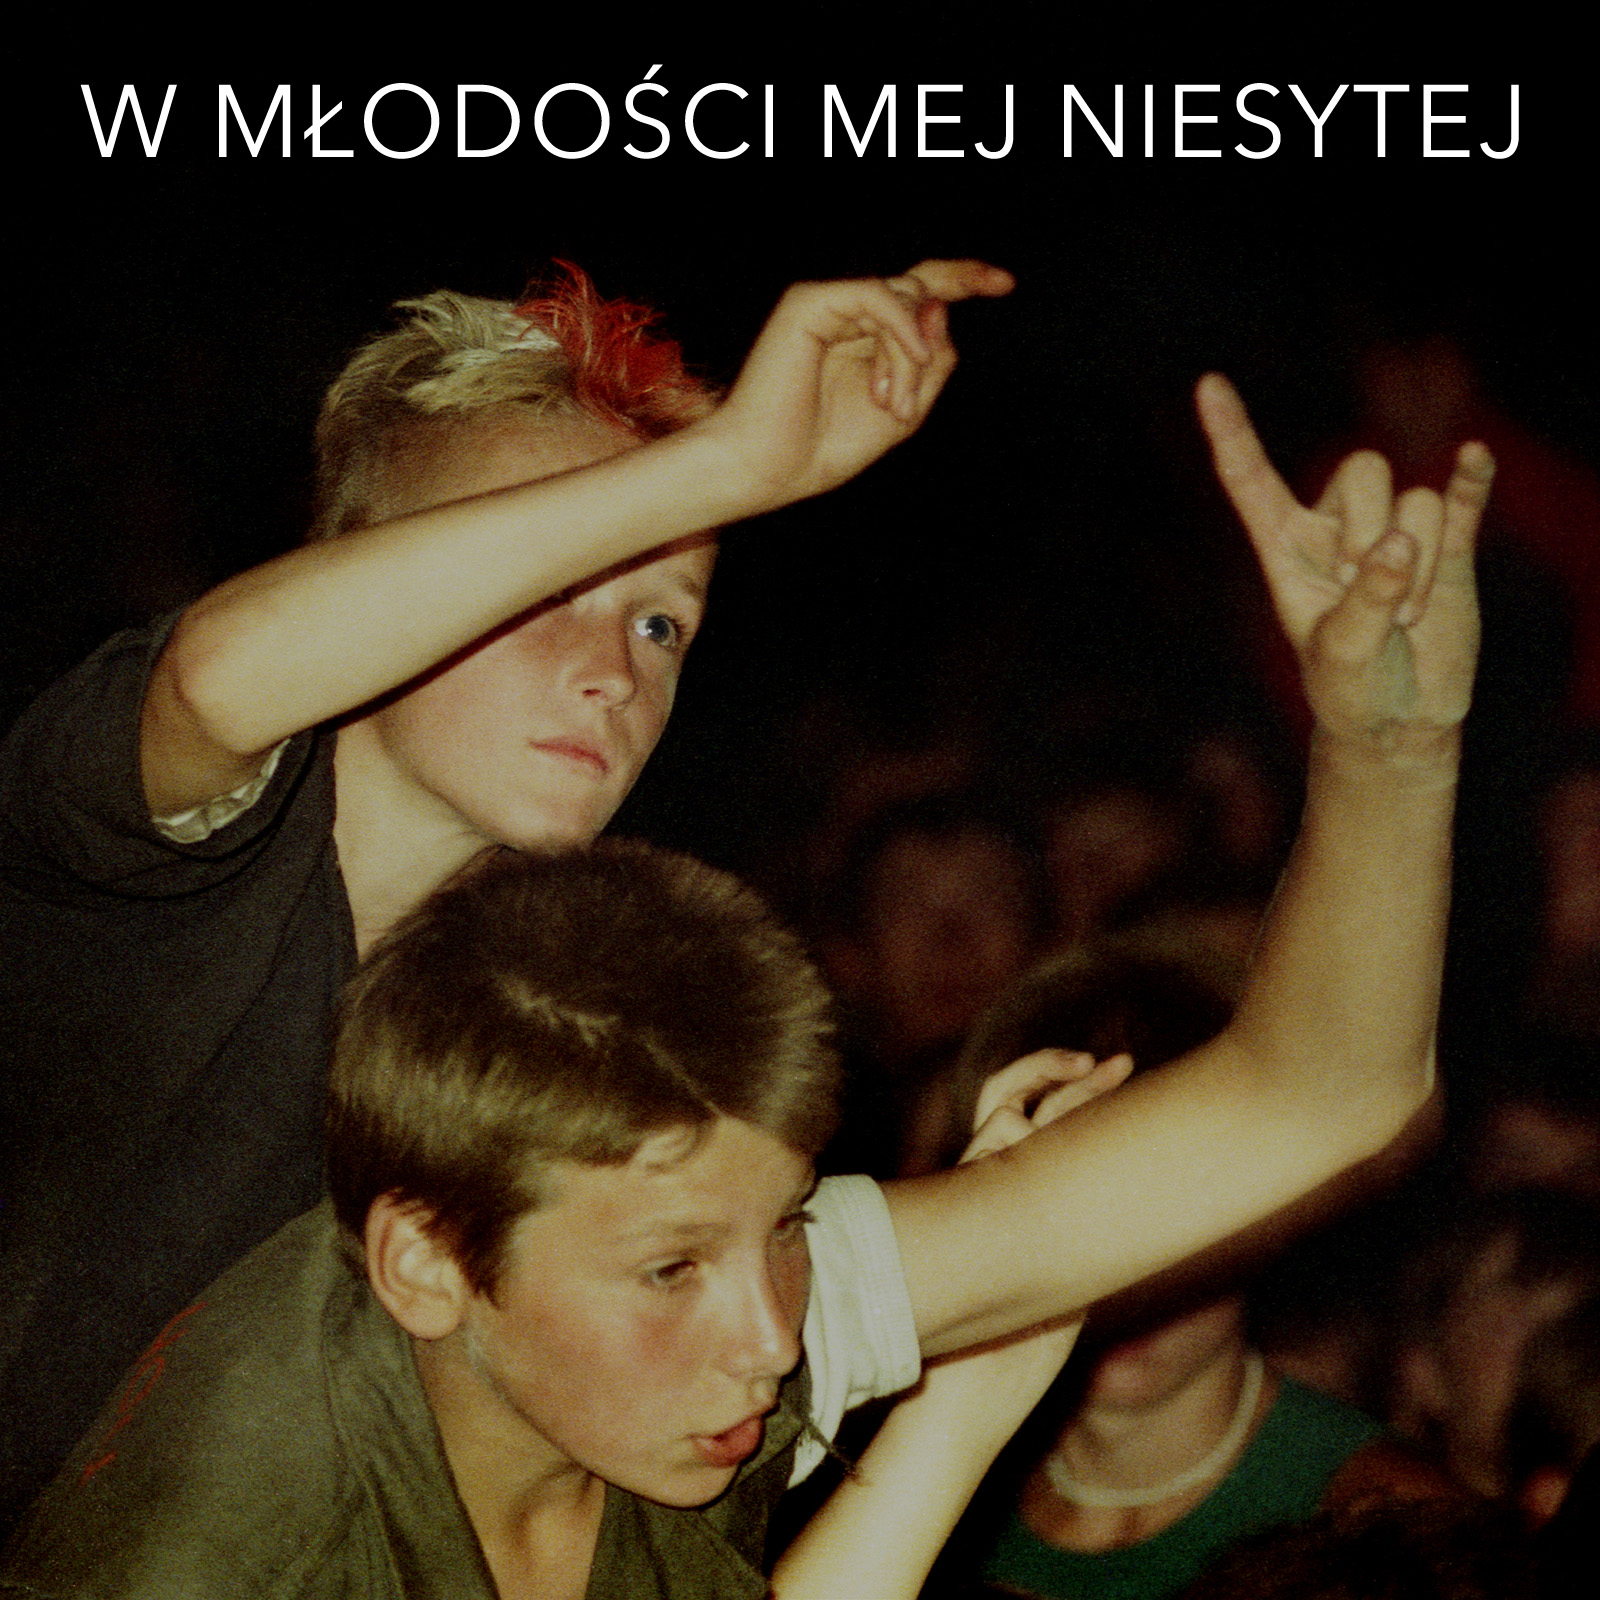 wmlodosci1